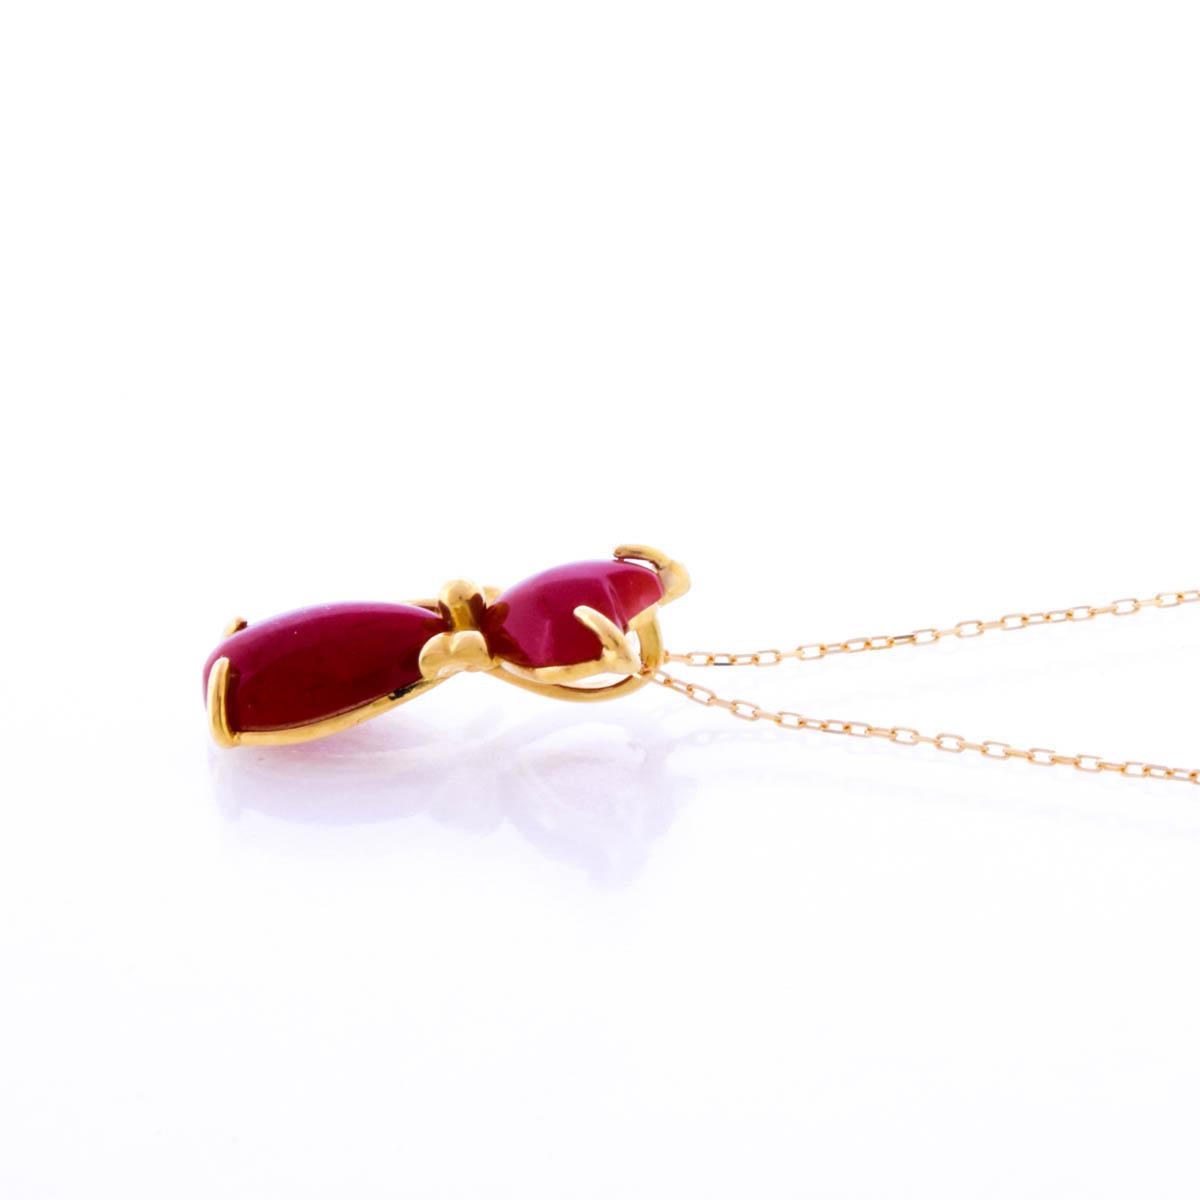 K18YG 赤珊瑚 ペンダント ネックレス ハート ネコ